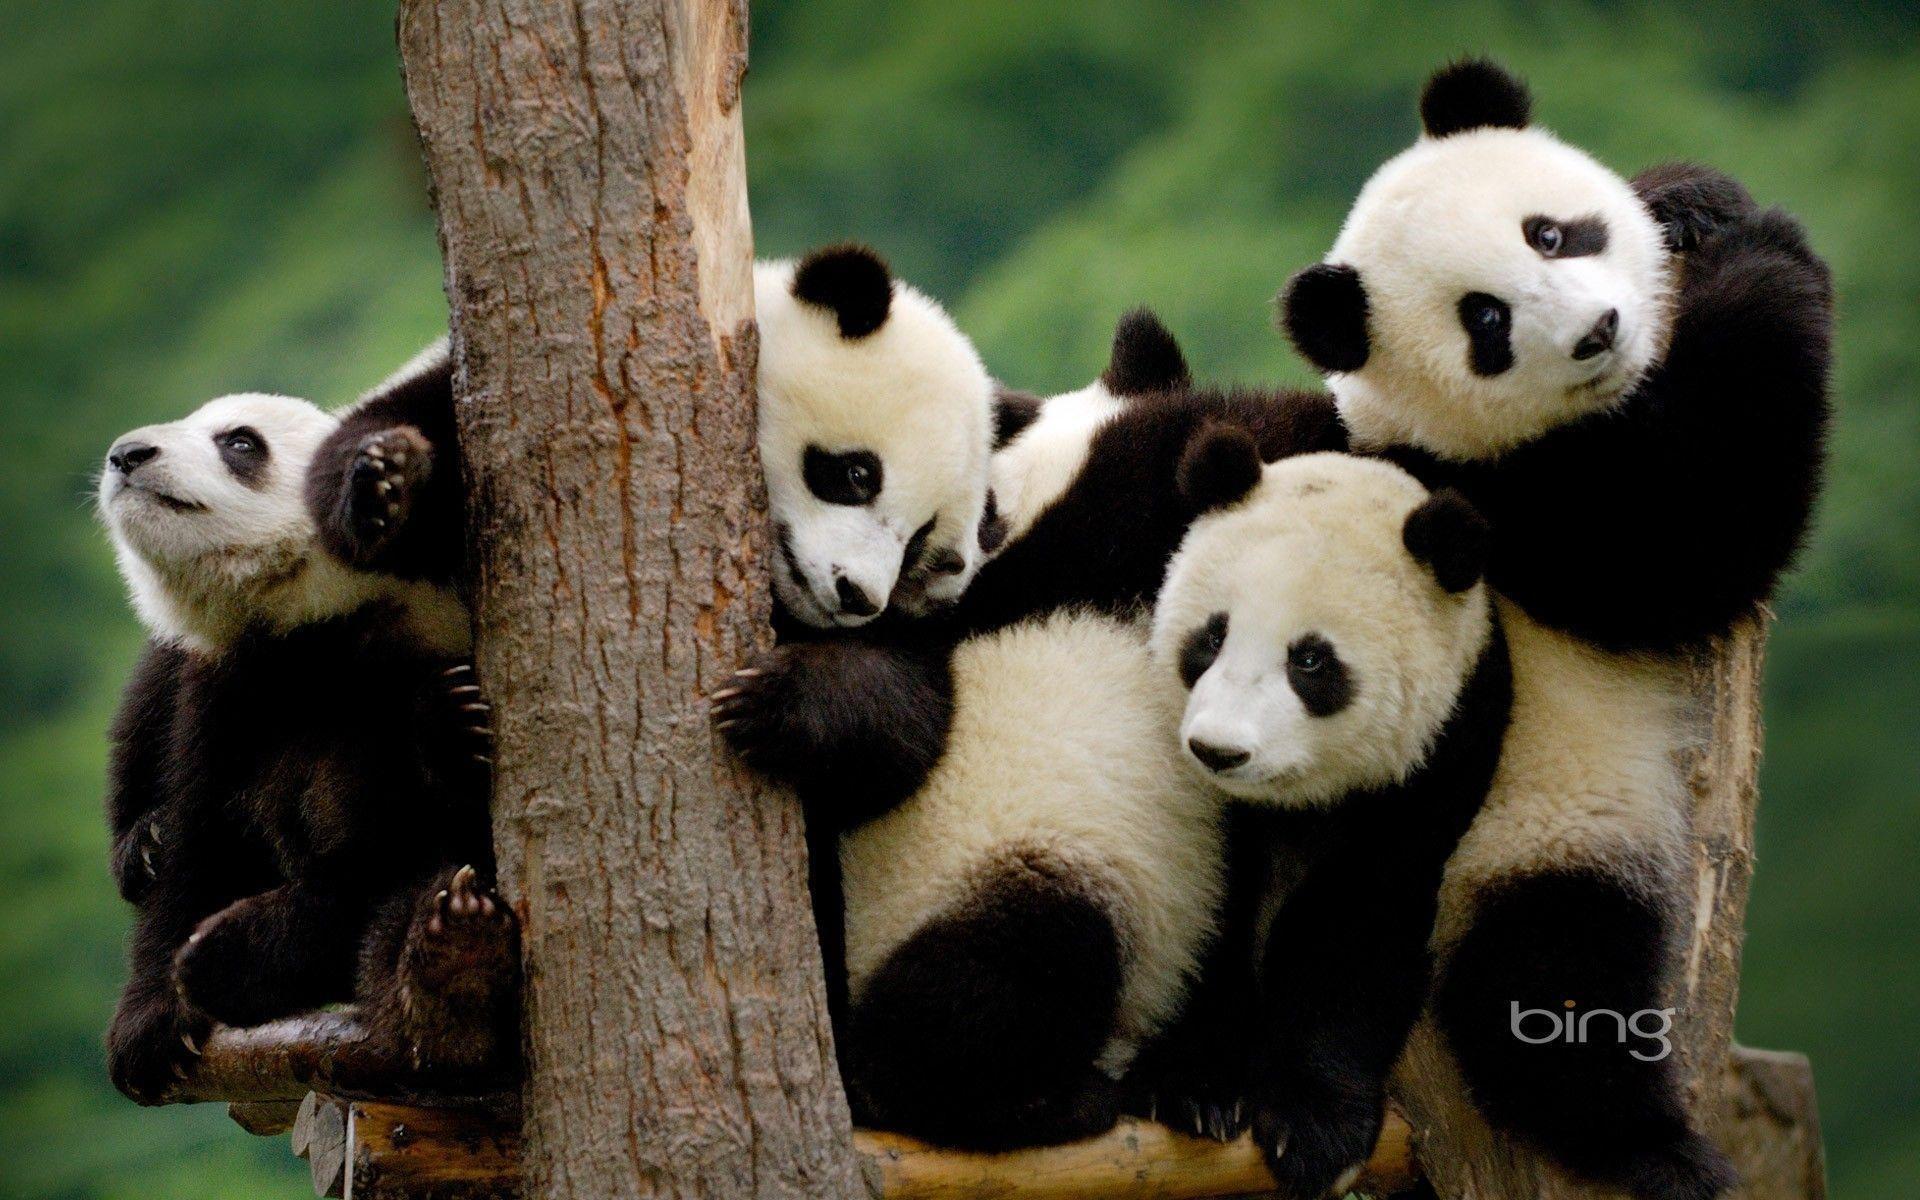 Panda Hd Wallpapers And Backgrounds 10 Http Www Urdunewtrend Com Hd Wallpapers Animal Panda Panda Hd Wallpapers And Back Baby Panda Bears Panda Bear Panda